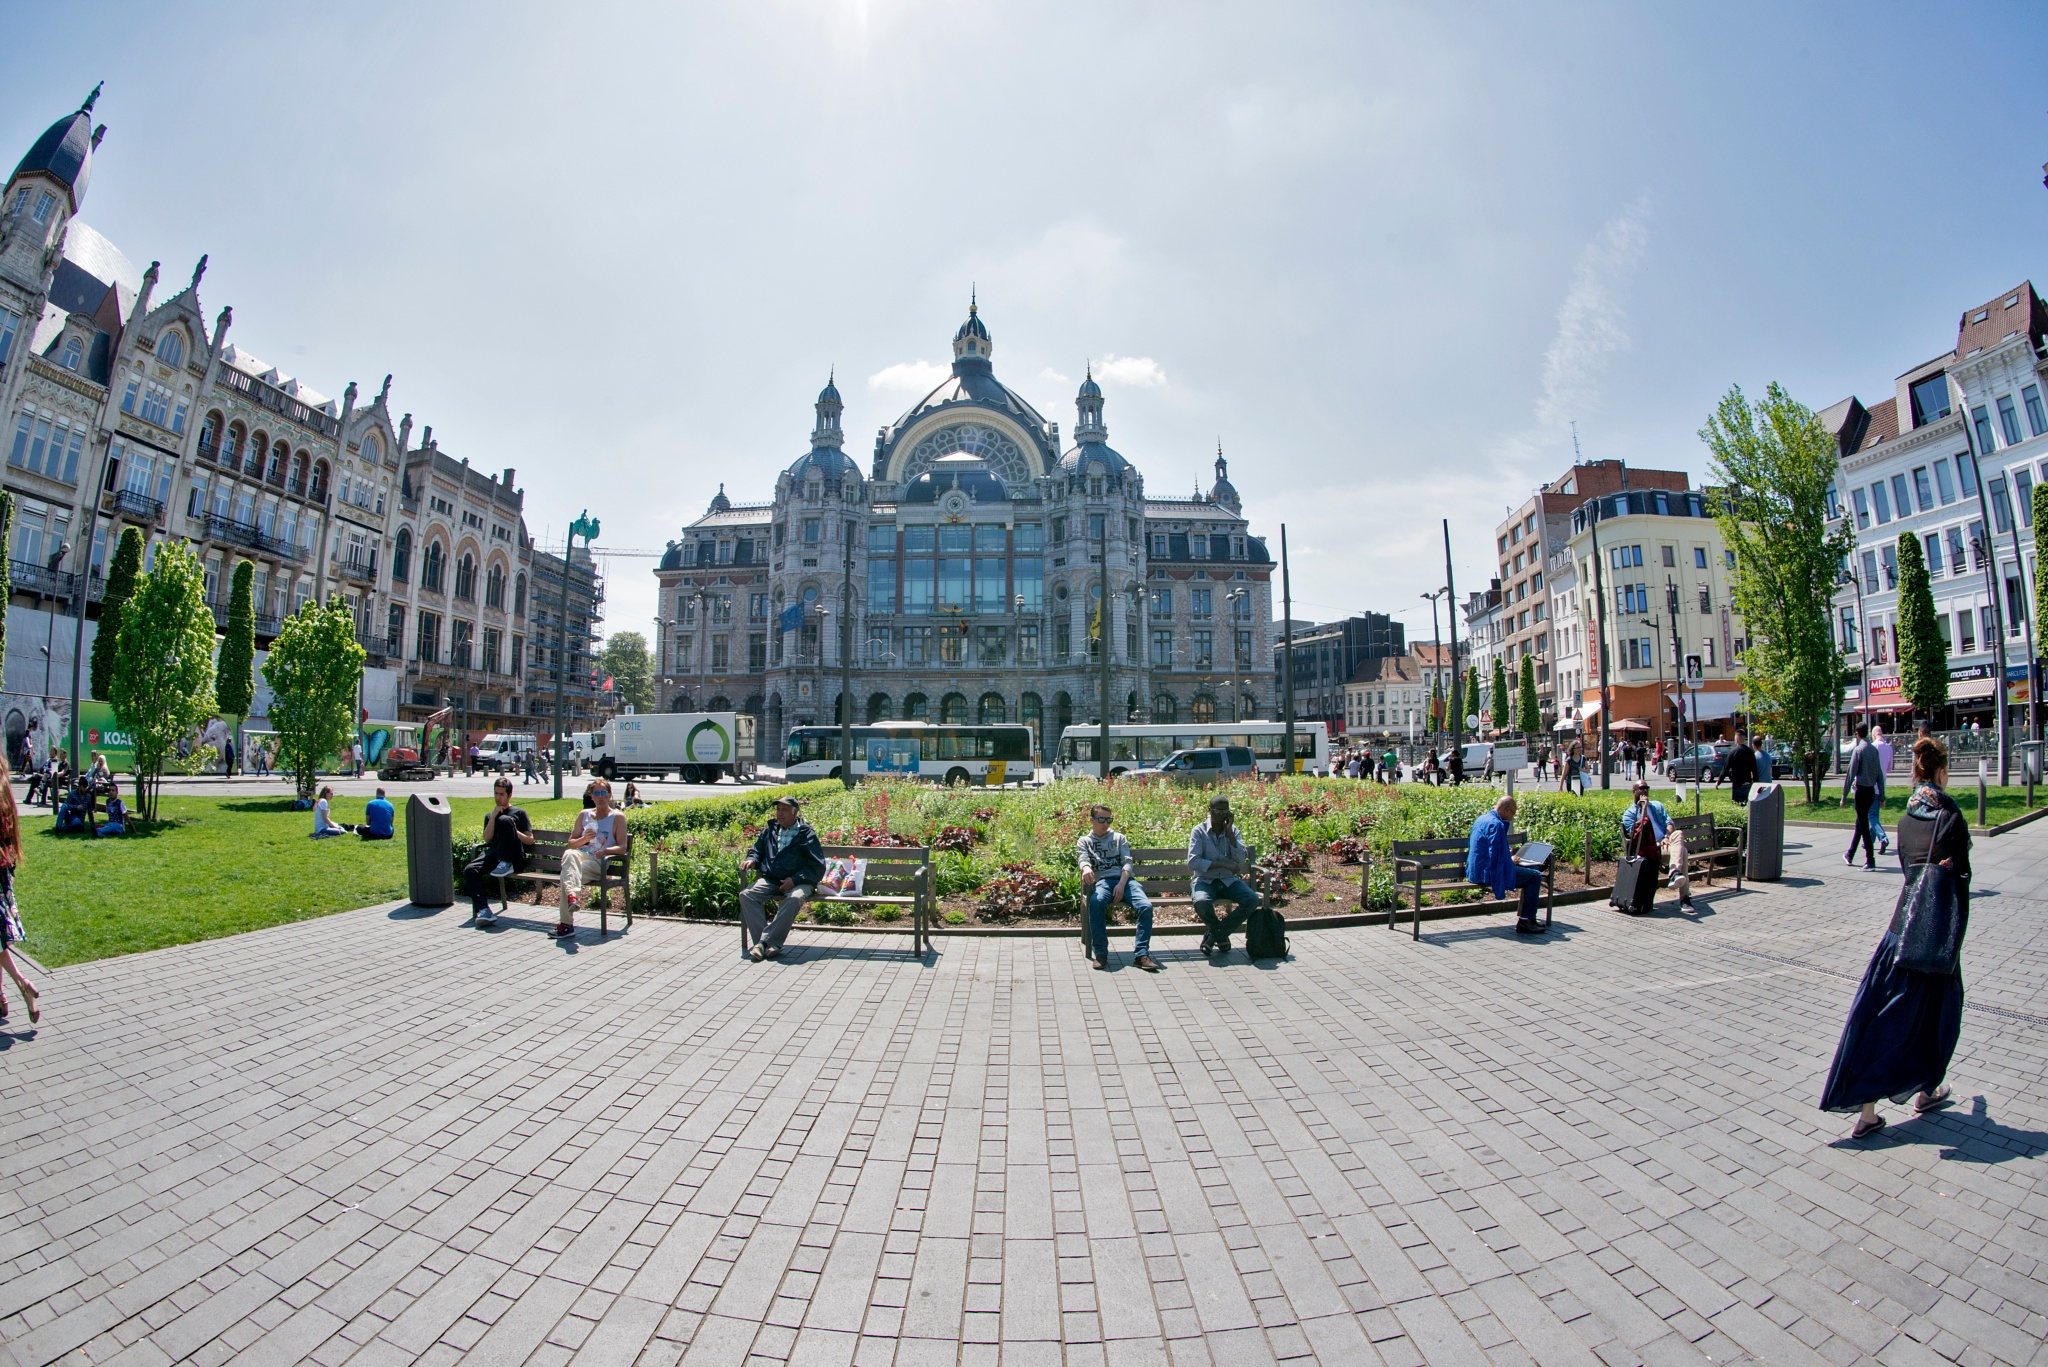 Centraal Station by Etienne de Maeyer